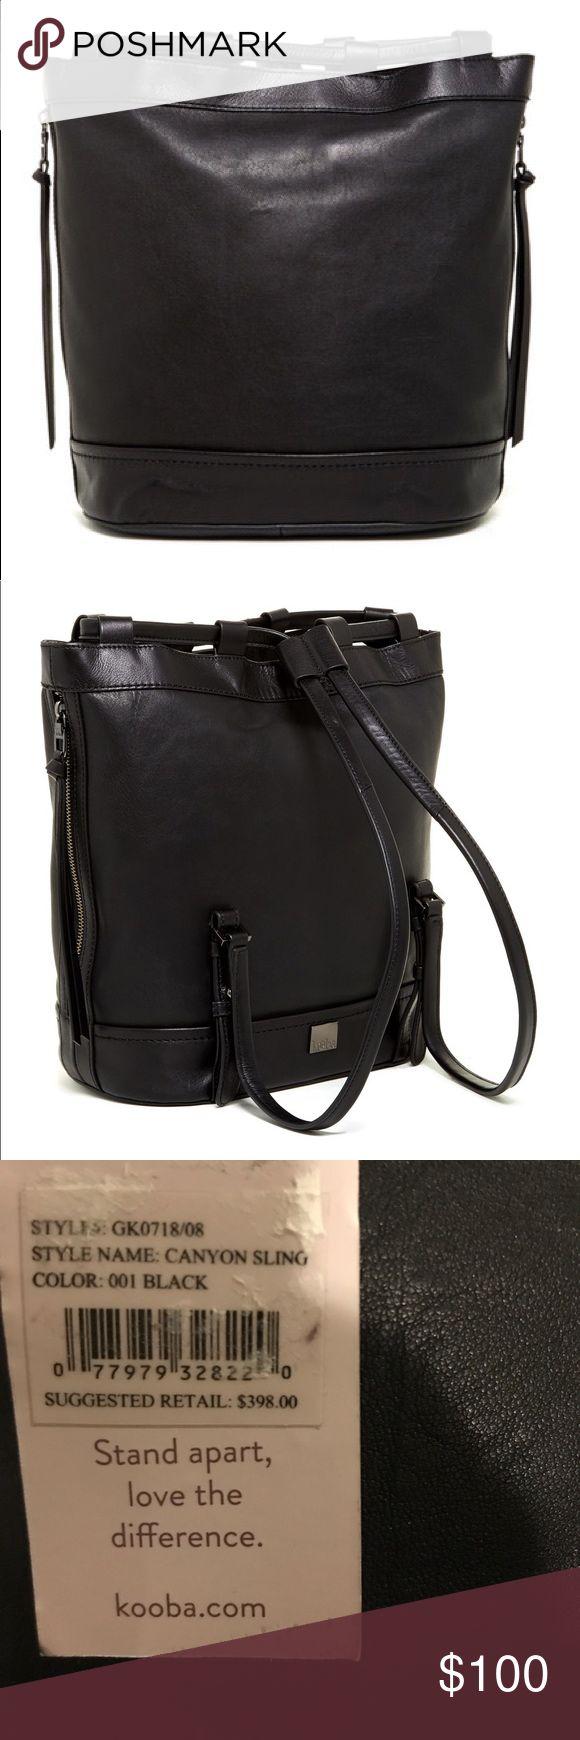 NWT! Kooba backpack NWT! Kooba canyon sling backpack! Black leather! Zippers on both sides for easy access! Kooba Bags Backpacks